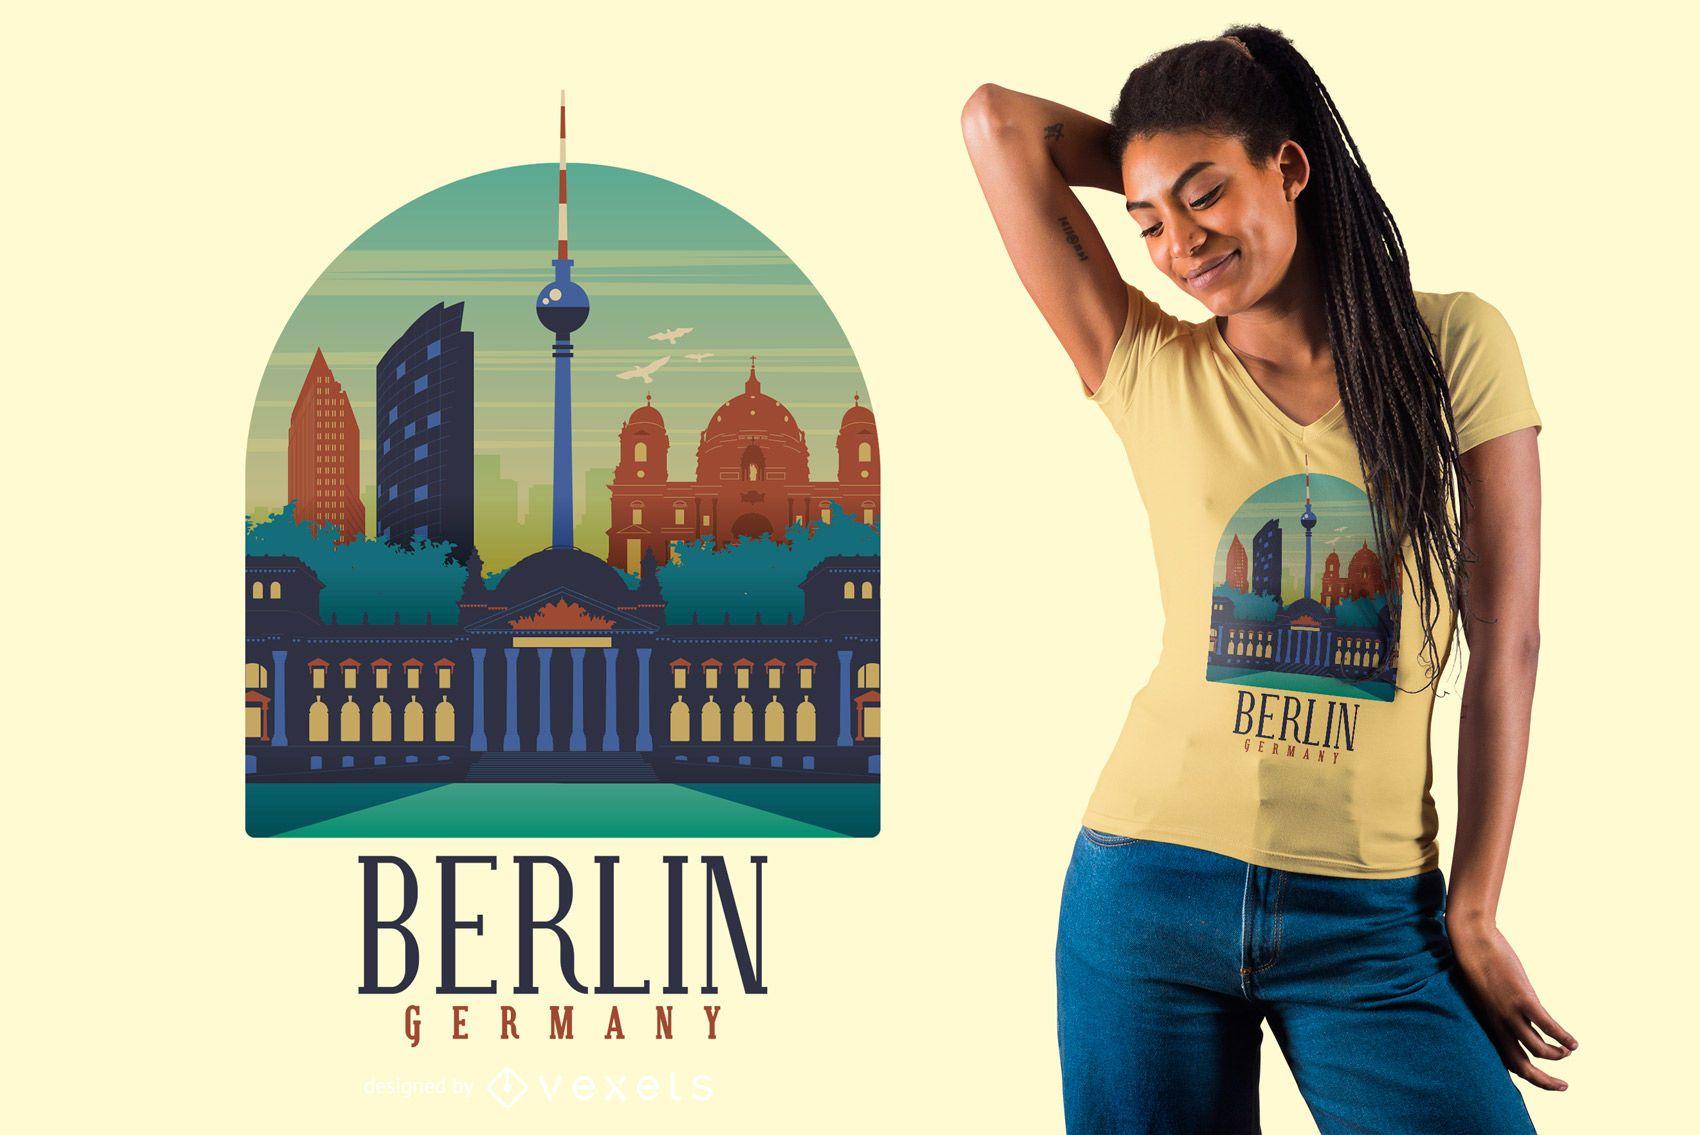 Berlin Germany t-shirt design